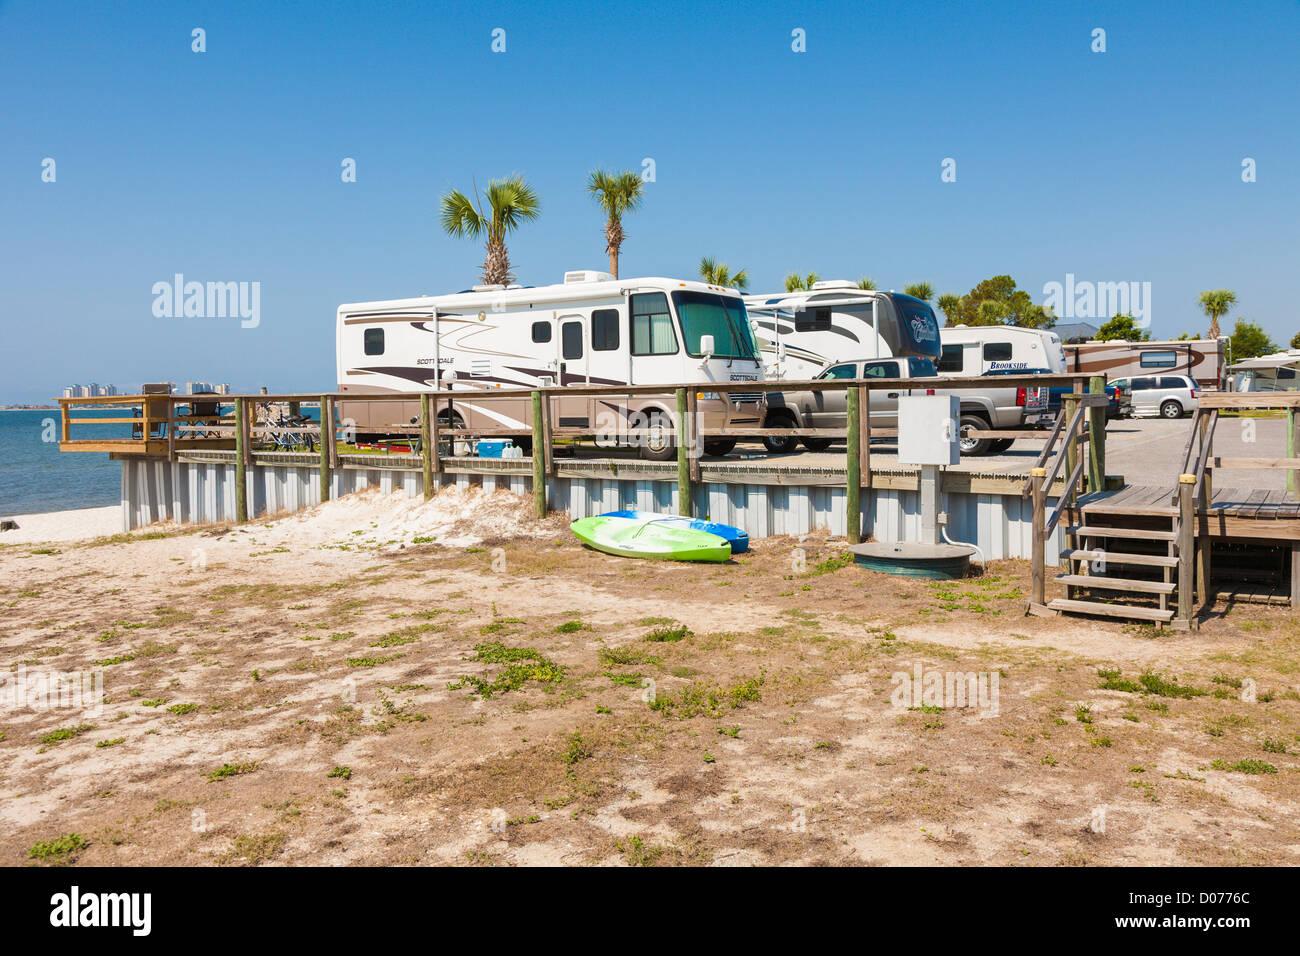 Motorhomes parked at waterfront RV resort on Santa Rosa Sound in Navarre, Florida - Stock Image